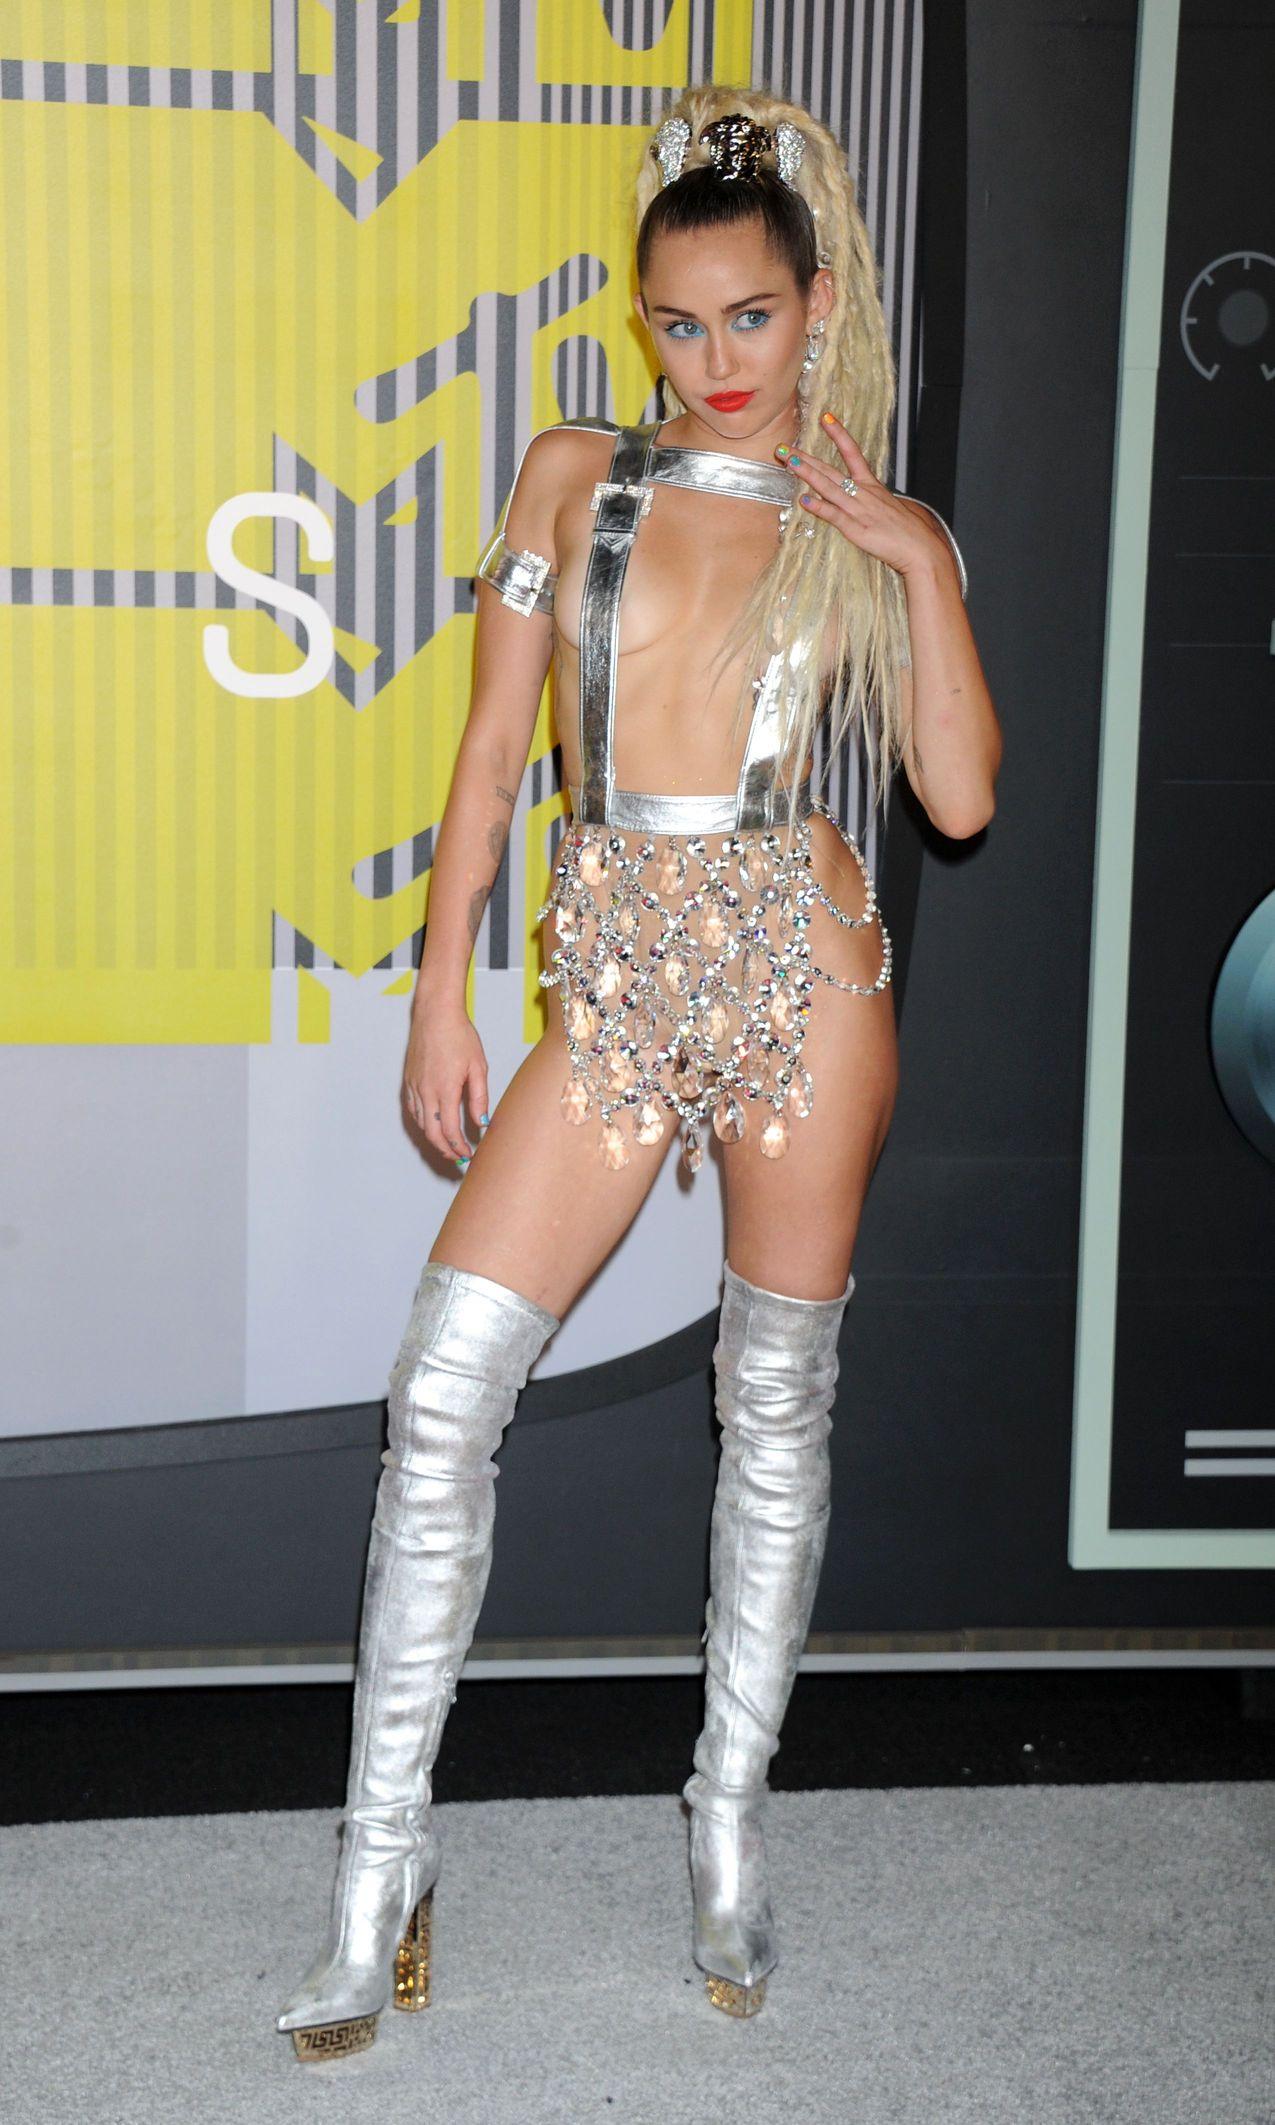 Miley Cyrus nipples exposed